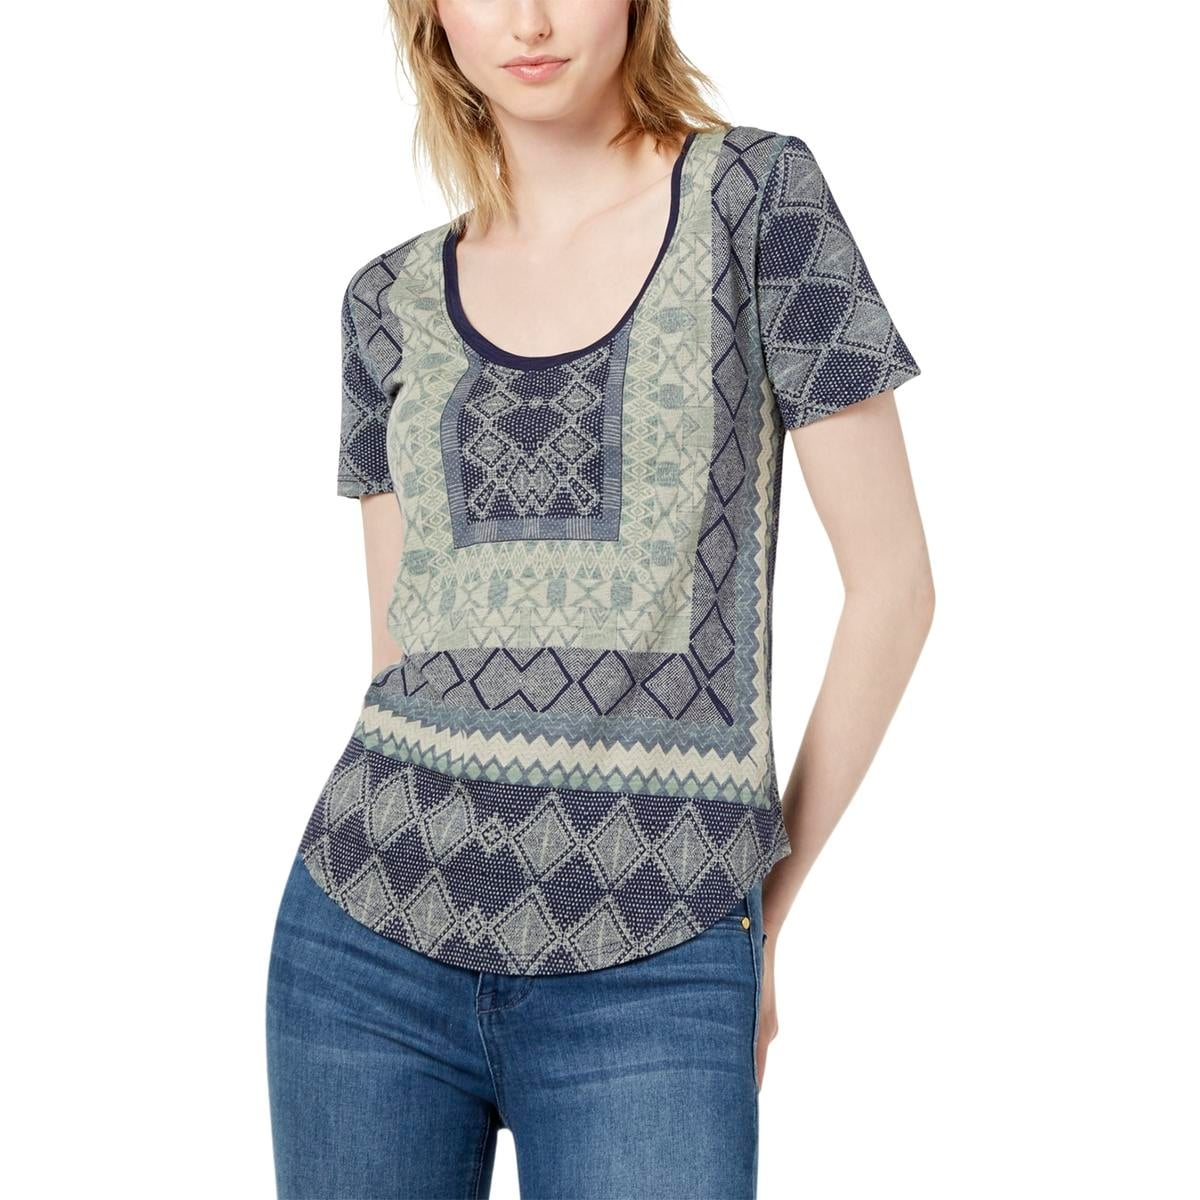 Lucky Brand Womens Graphic Tee Shirt Short Sleeve Grey Heart Soft Scoop Size XXL